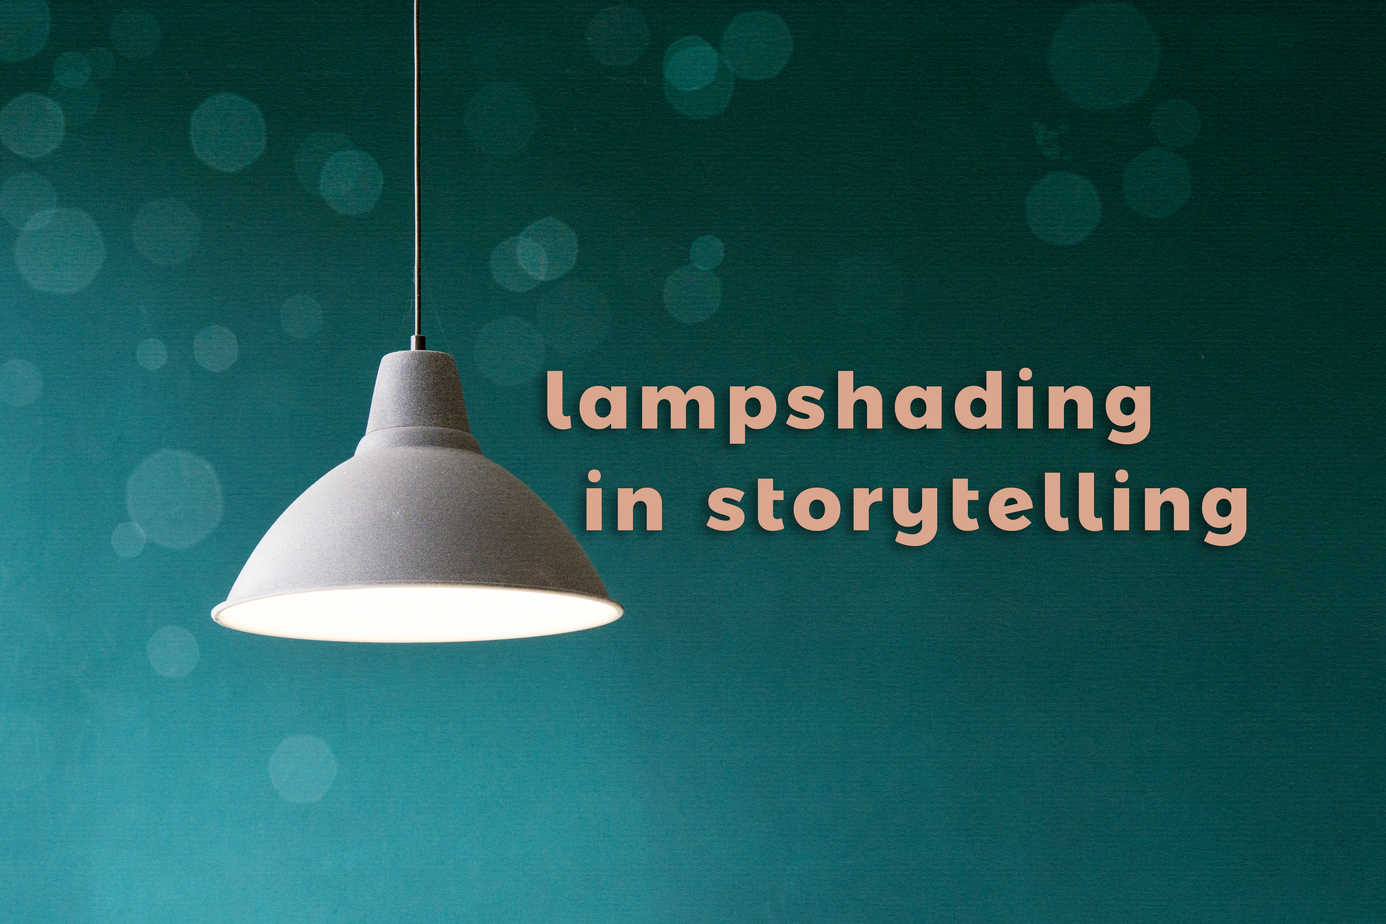 lampshading in storytelling